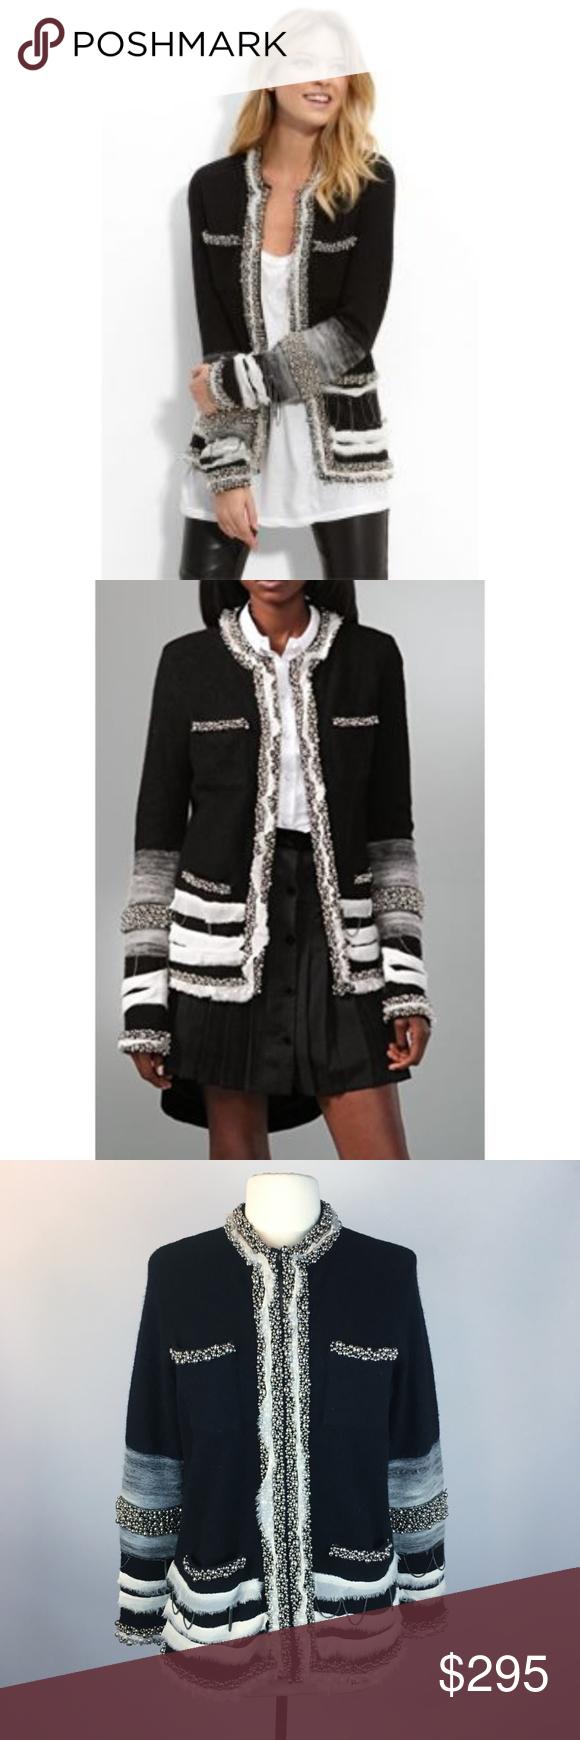 Dvf Rare Lexi Jacket Wool Silk Beads Black M Diane Von Furstenberg Lexi Wool Jacket With Needle Felting Chain And Beadwo Clothes Design Fashion Fashion Design [ 1740 x 580 Pixel ]